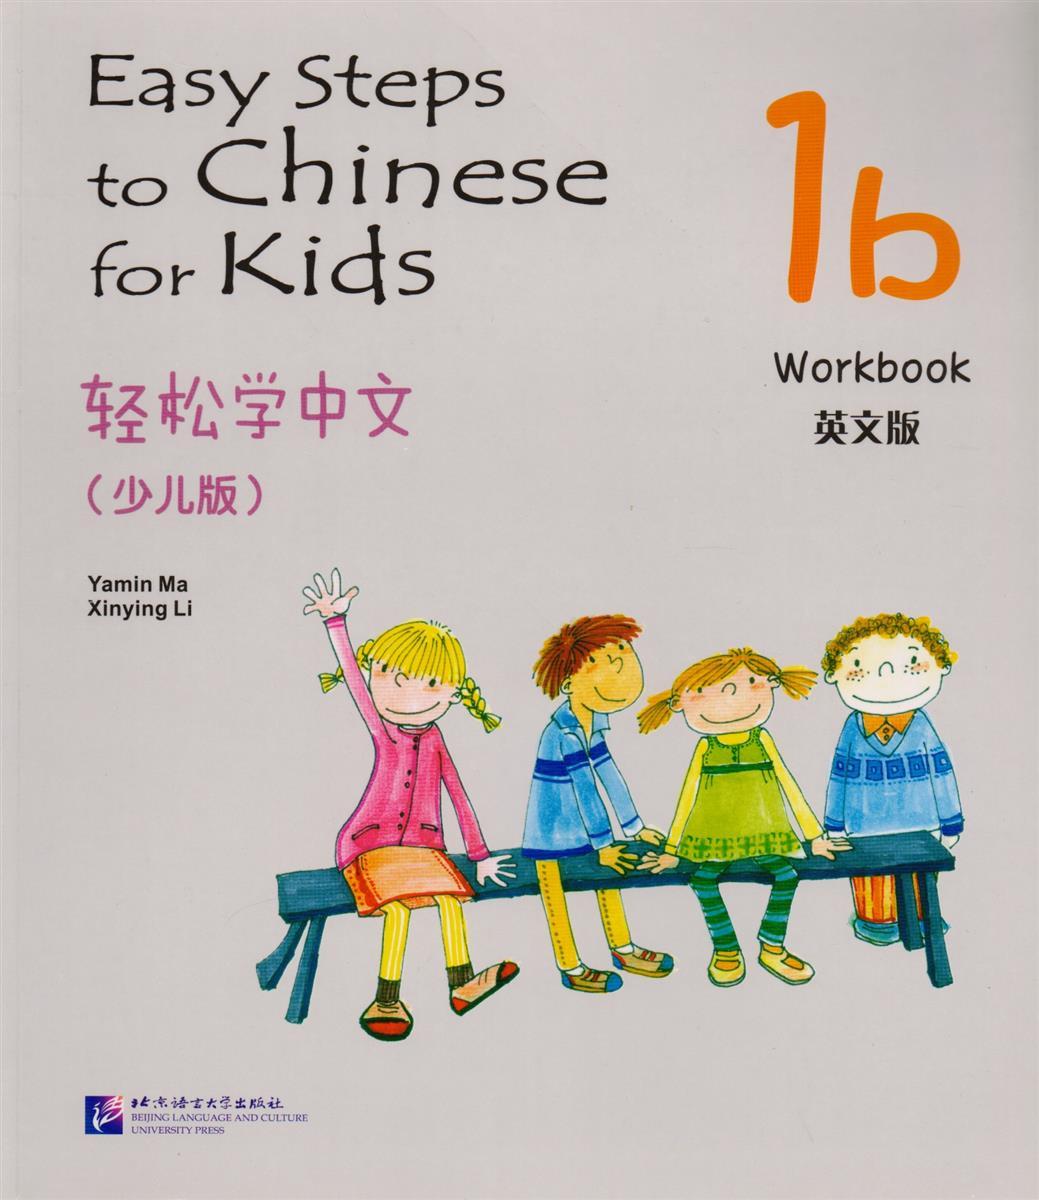 Yamin Ma Easy Steps to Chinese for kids 1B - WB / Легкие Шаги к Китайскому для детей. Часть 1B - Рабочая тетрадь (на китайском и английском языках) настенная плитка love ceramic tiles essentia square white ret 35x100